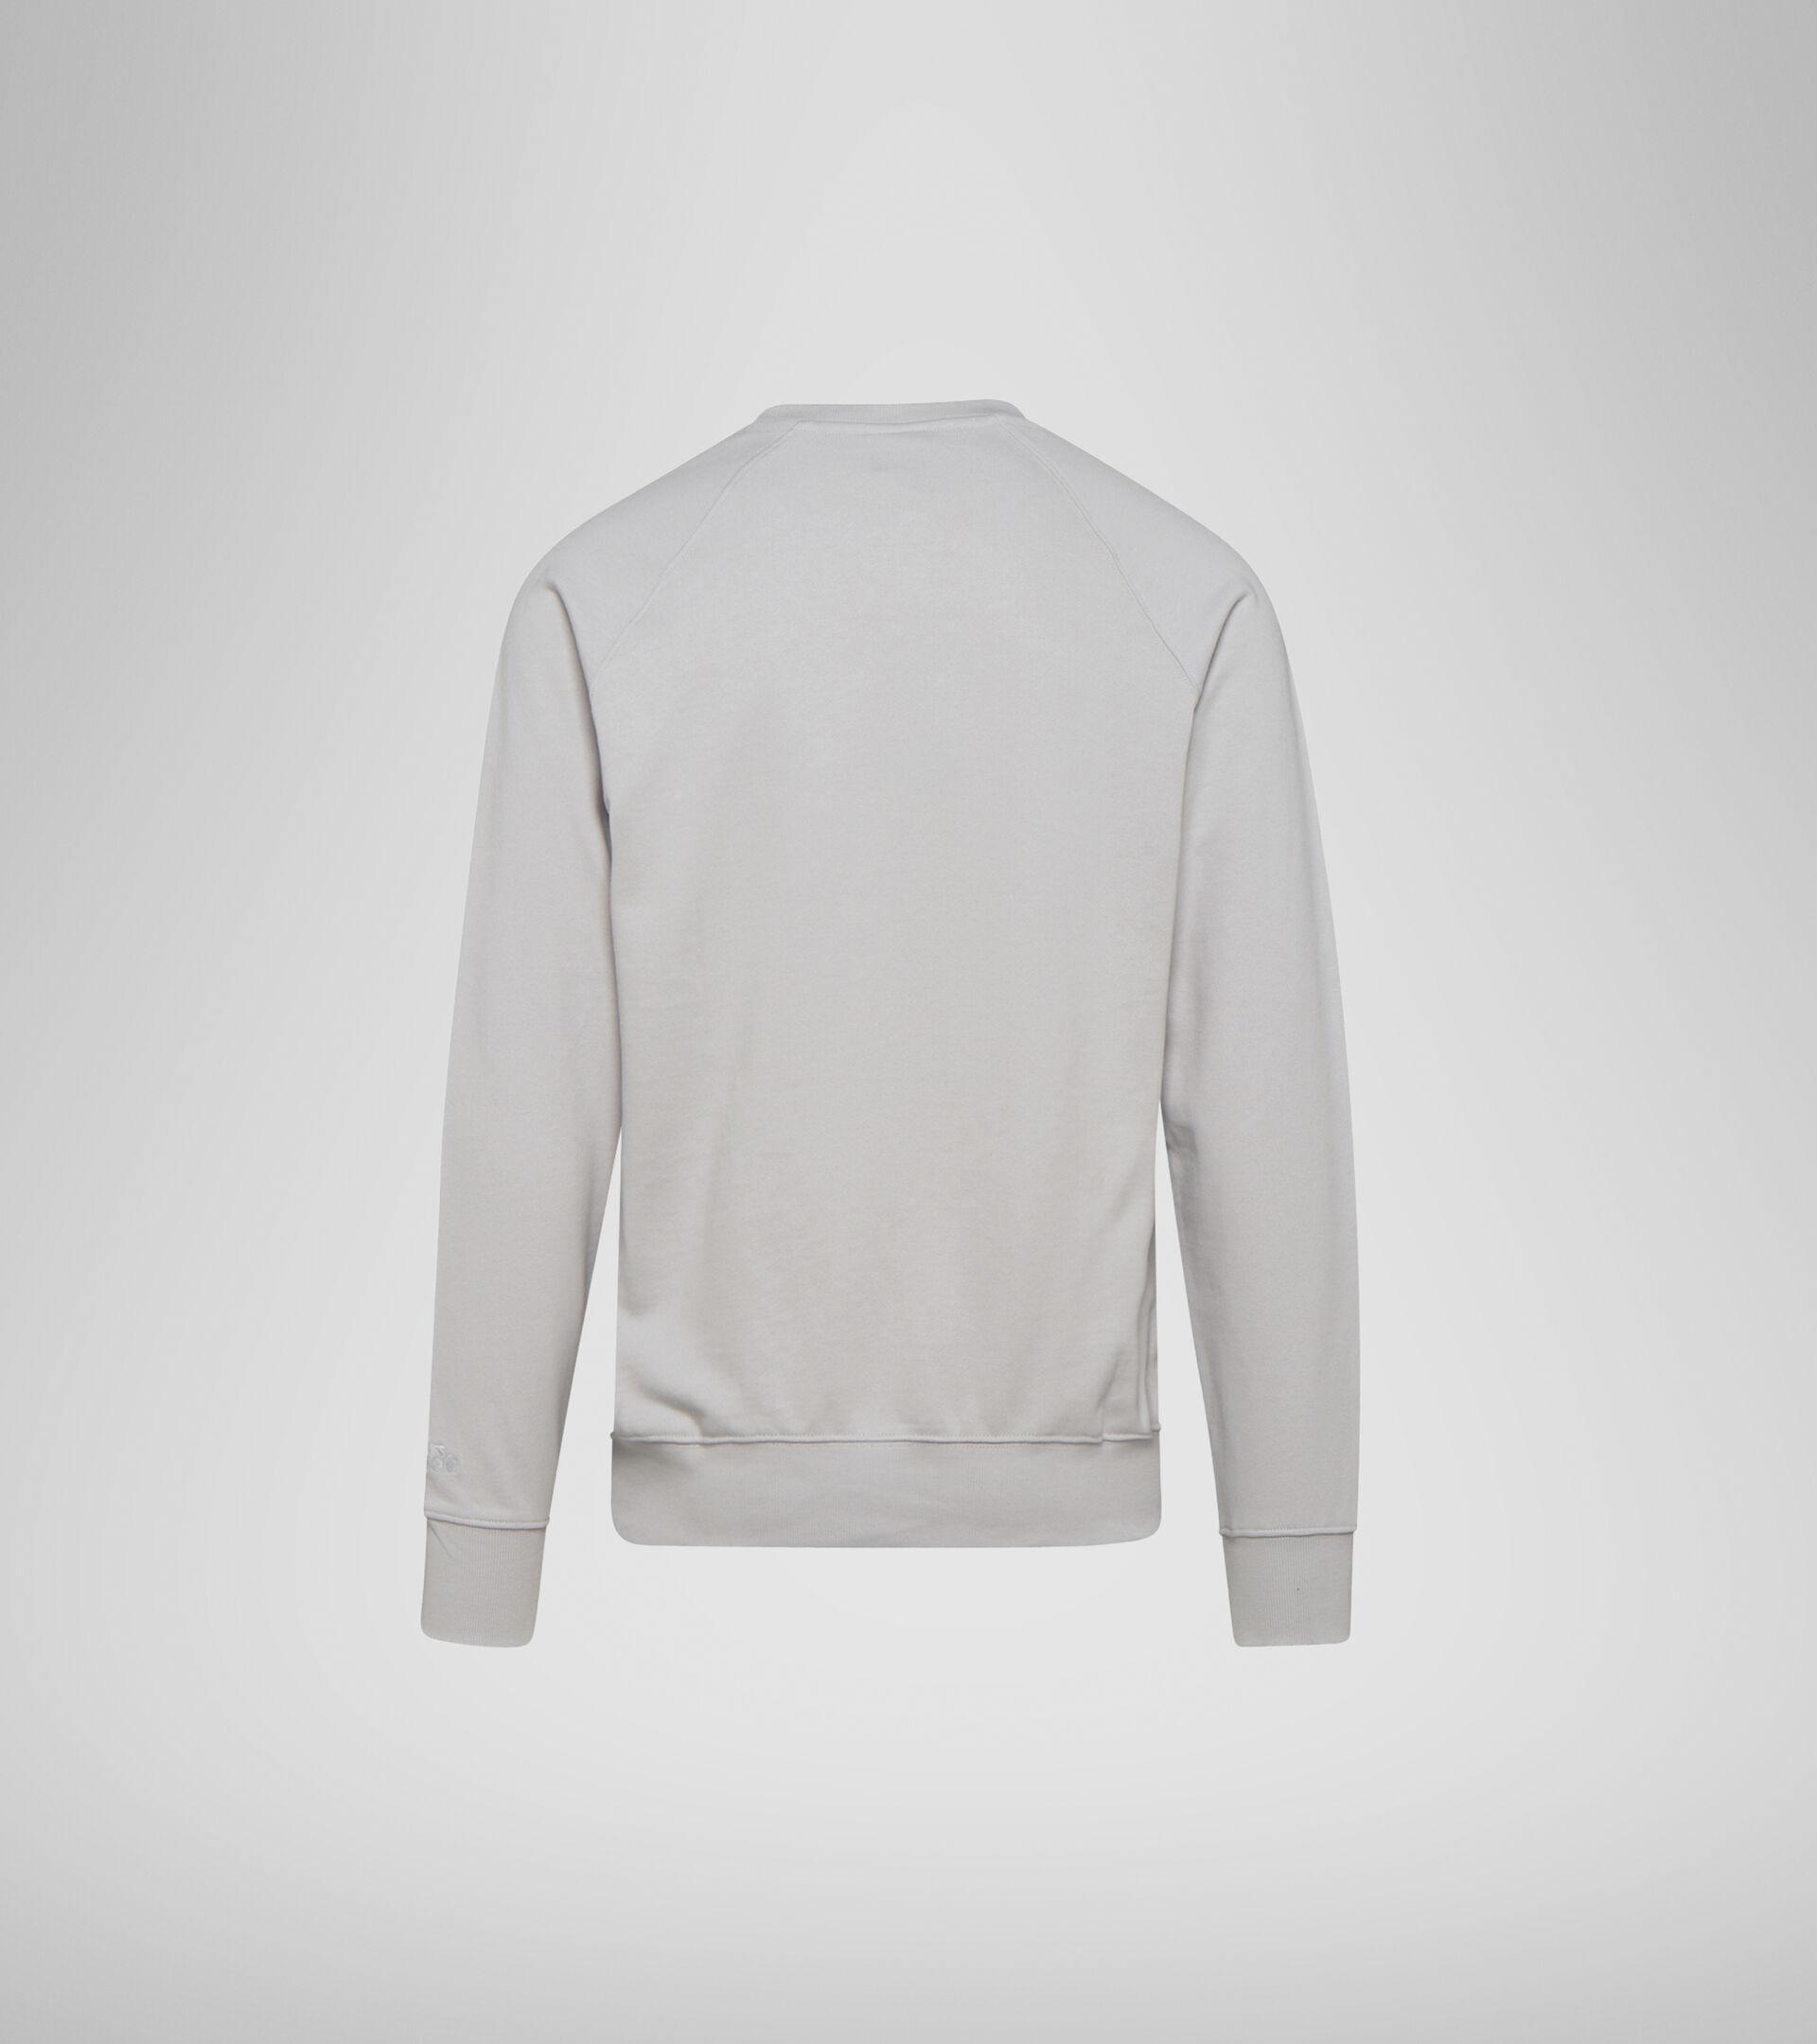 Apparel Sportswear UOMO SWEATSHIRT CREW SPECTRA GRIS GIRGOLA Diadora